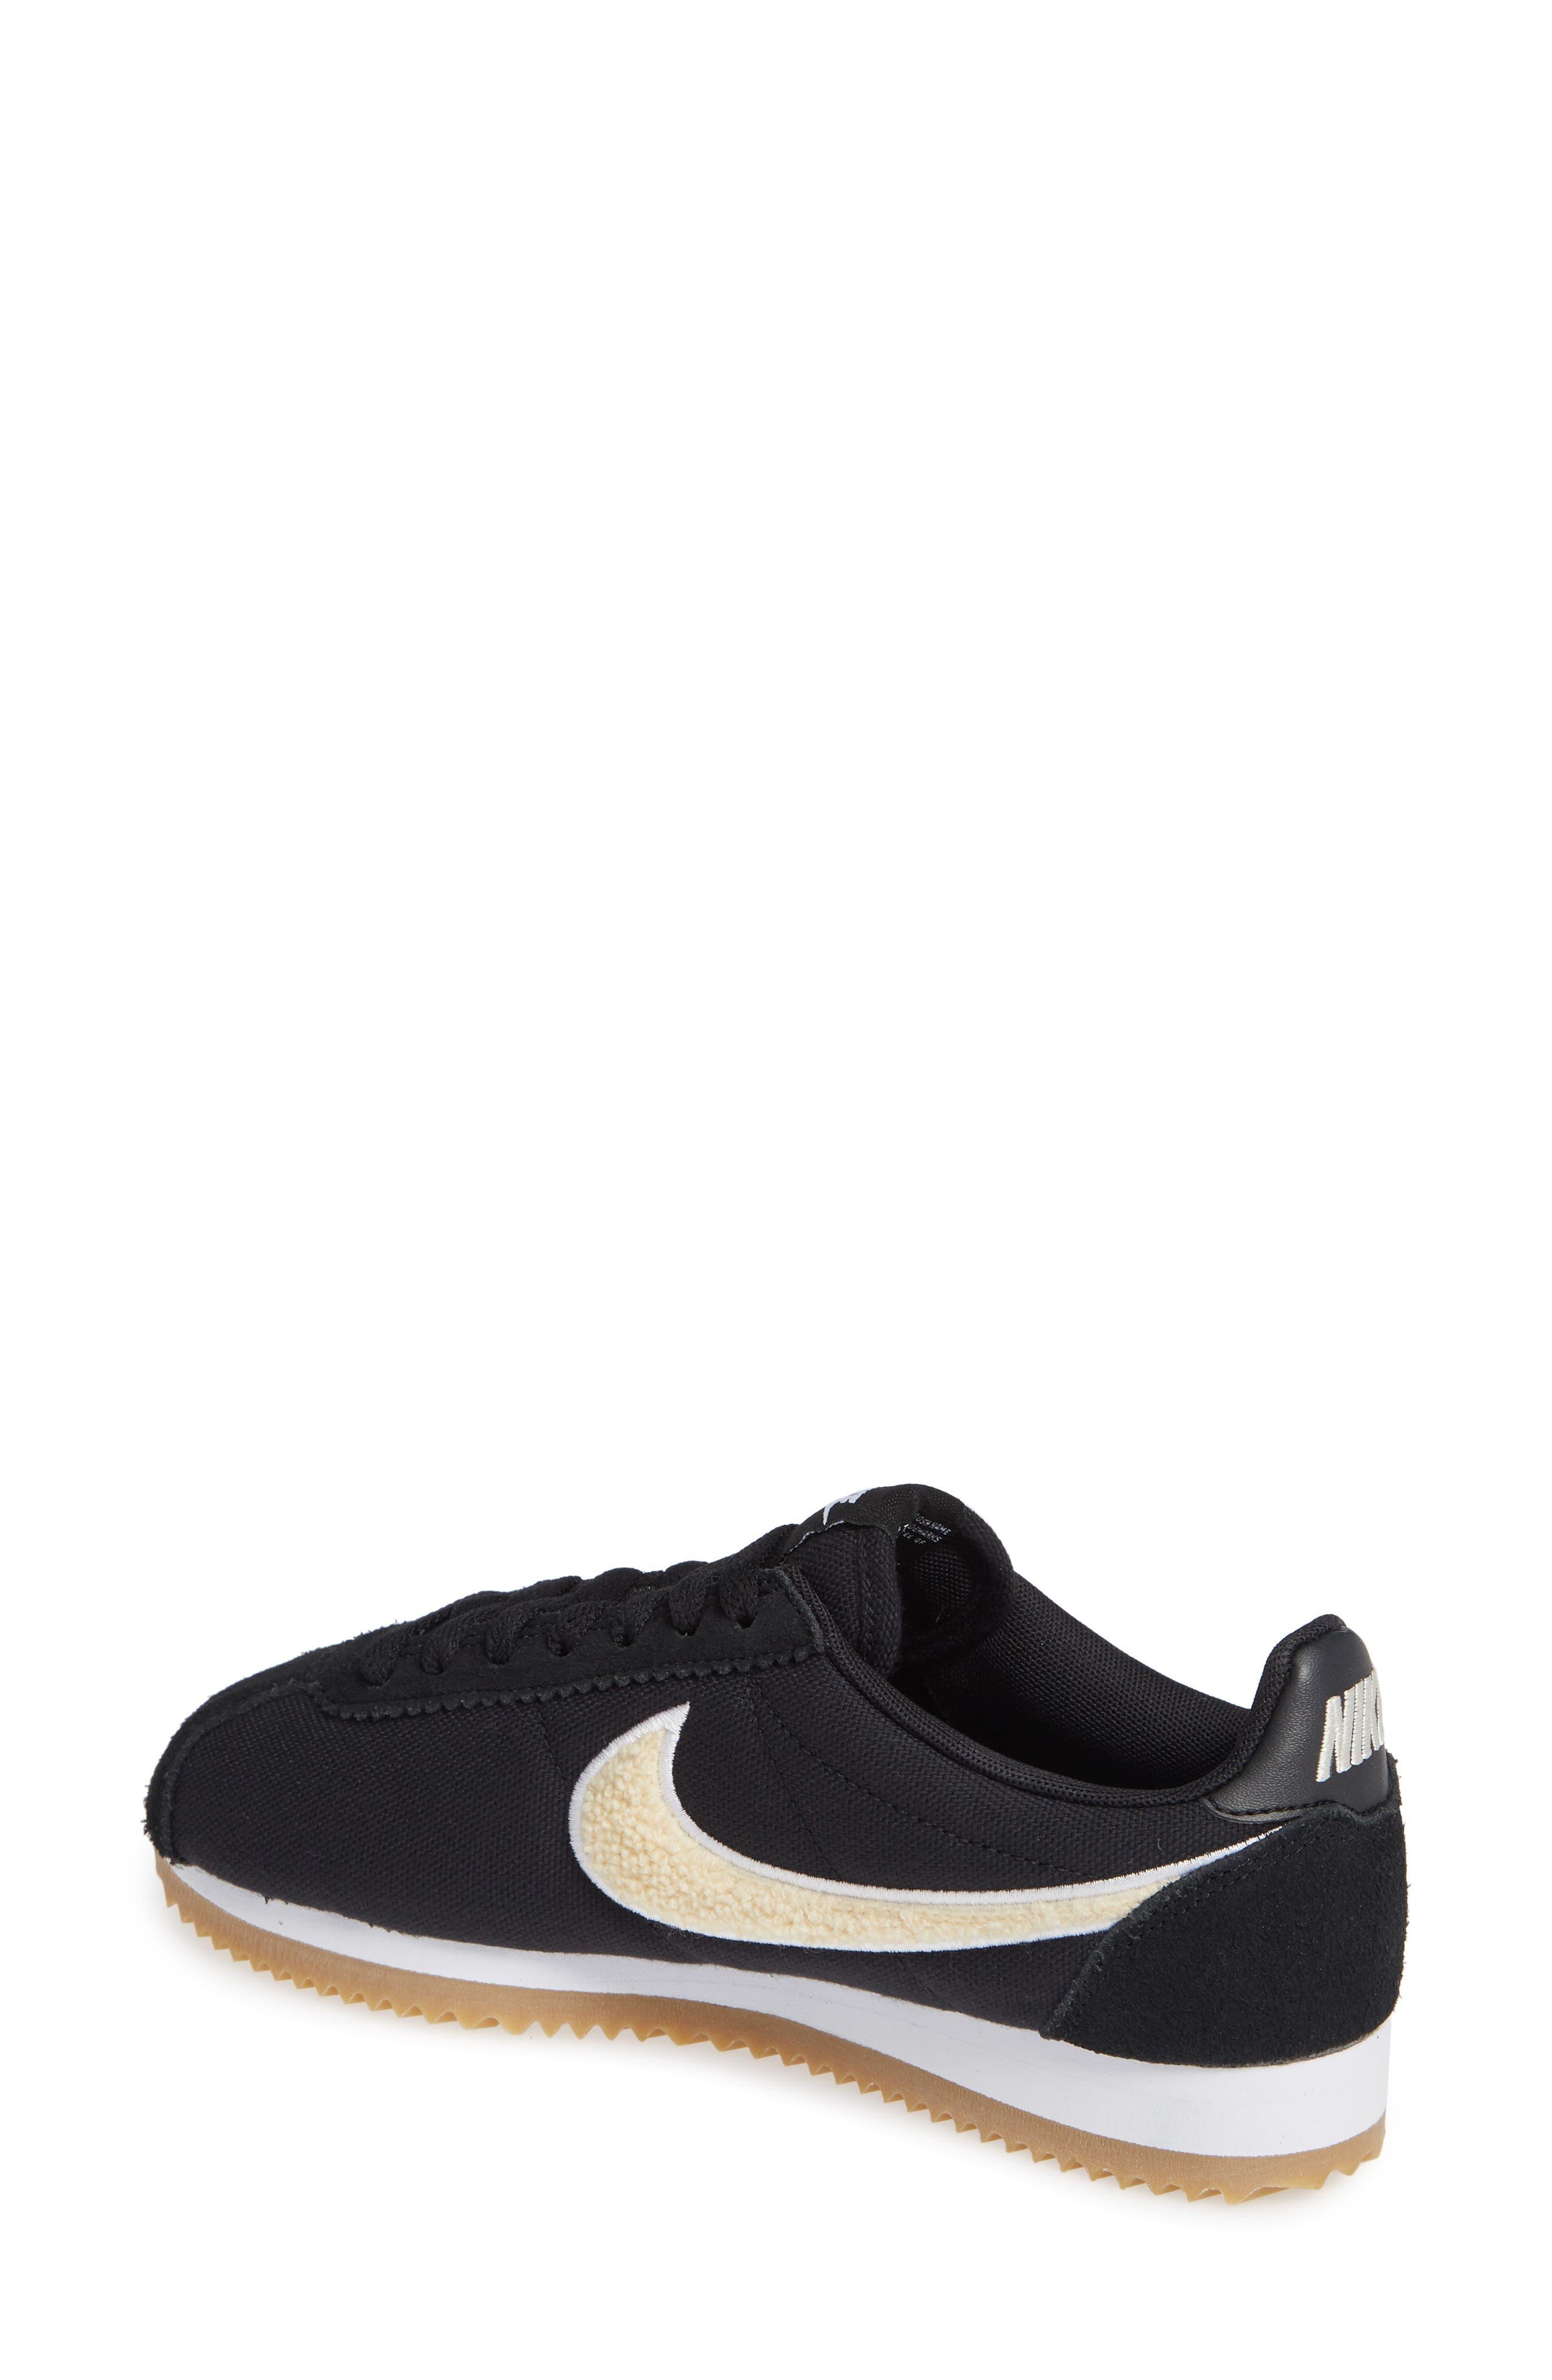 Classic Cortez Premium XLV Sneaker,                             Alternate thumbnail 2, color,                             Black/ Light Cream/ Brown